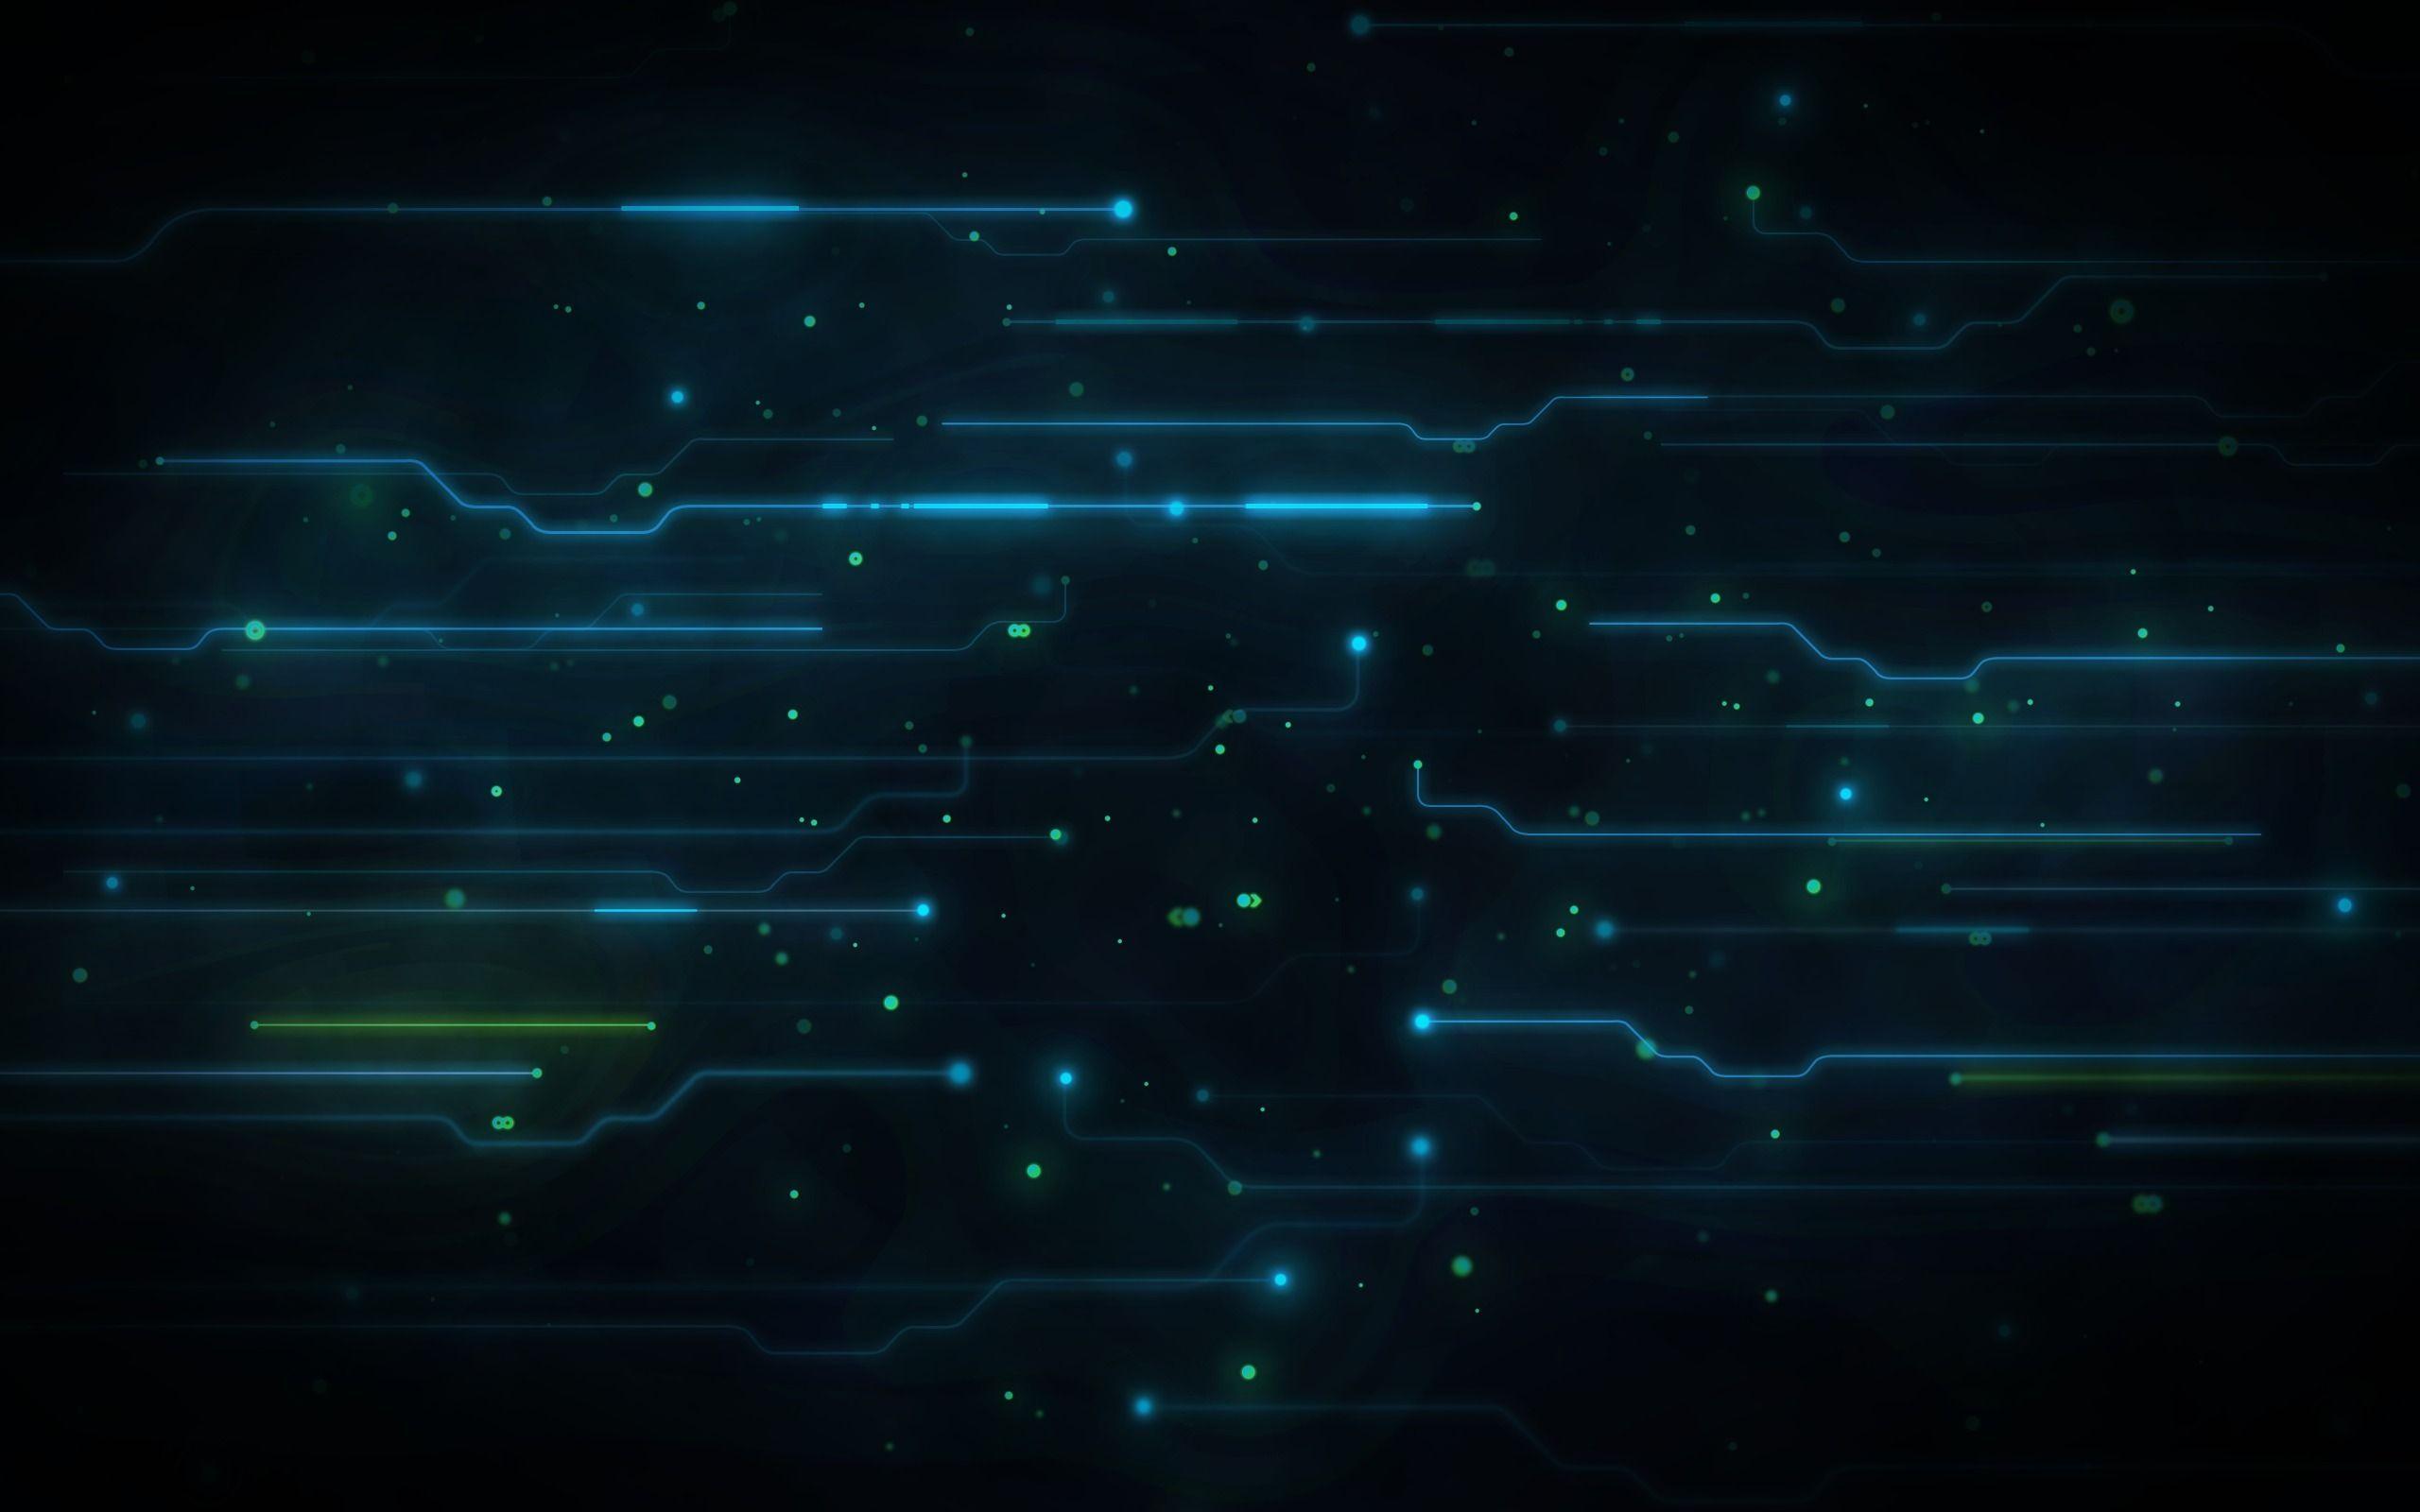 High Tech Abstract Wallpaper Electronics Wallpaper Technology Wallpaper Abstract Digital Art